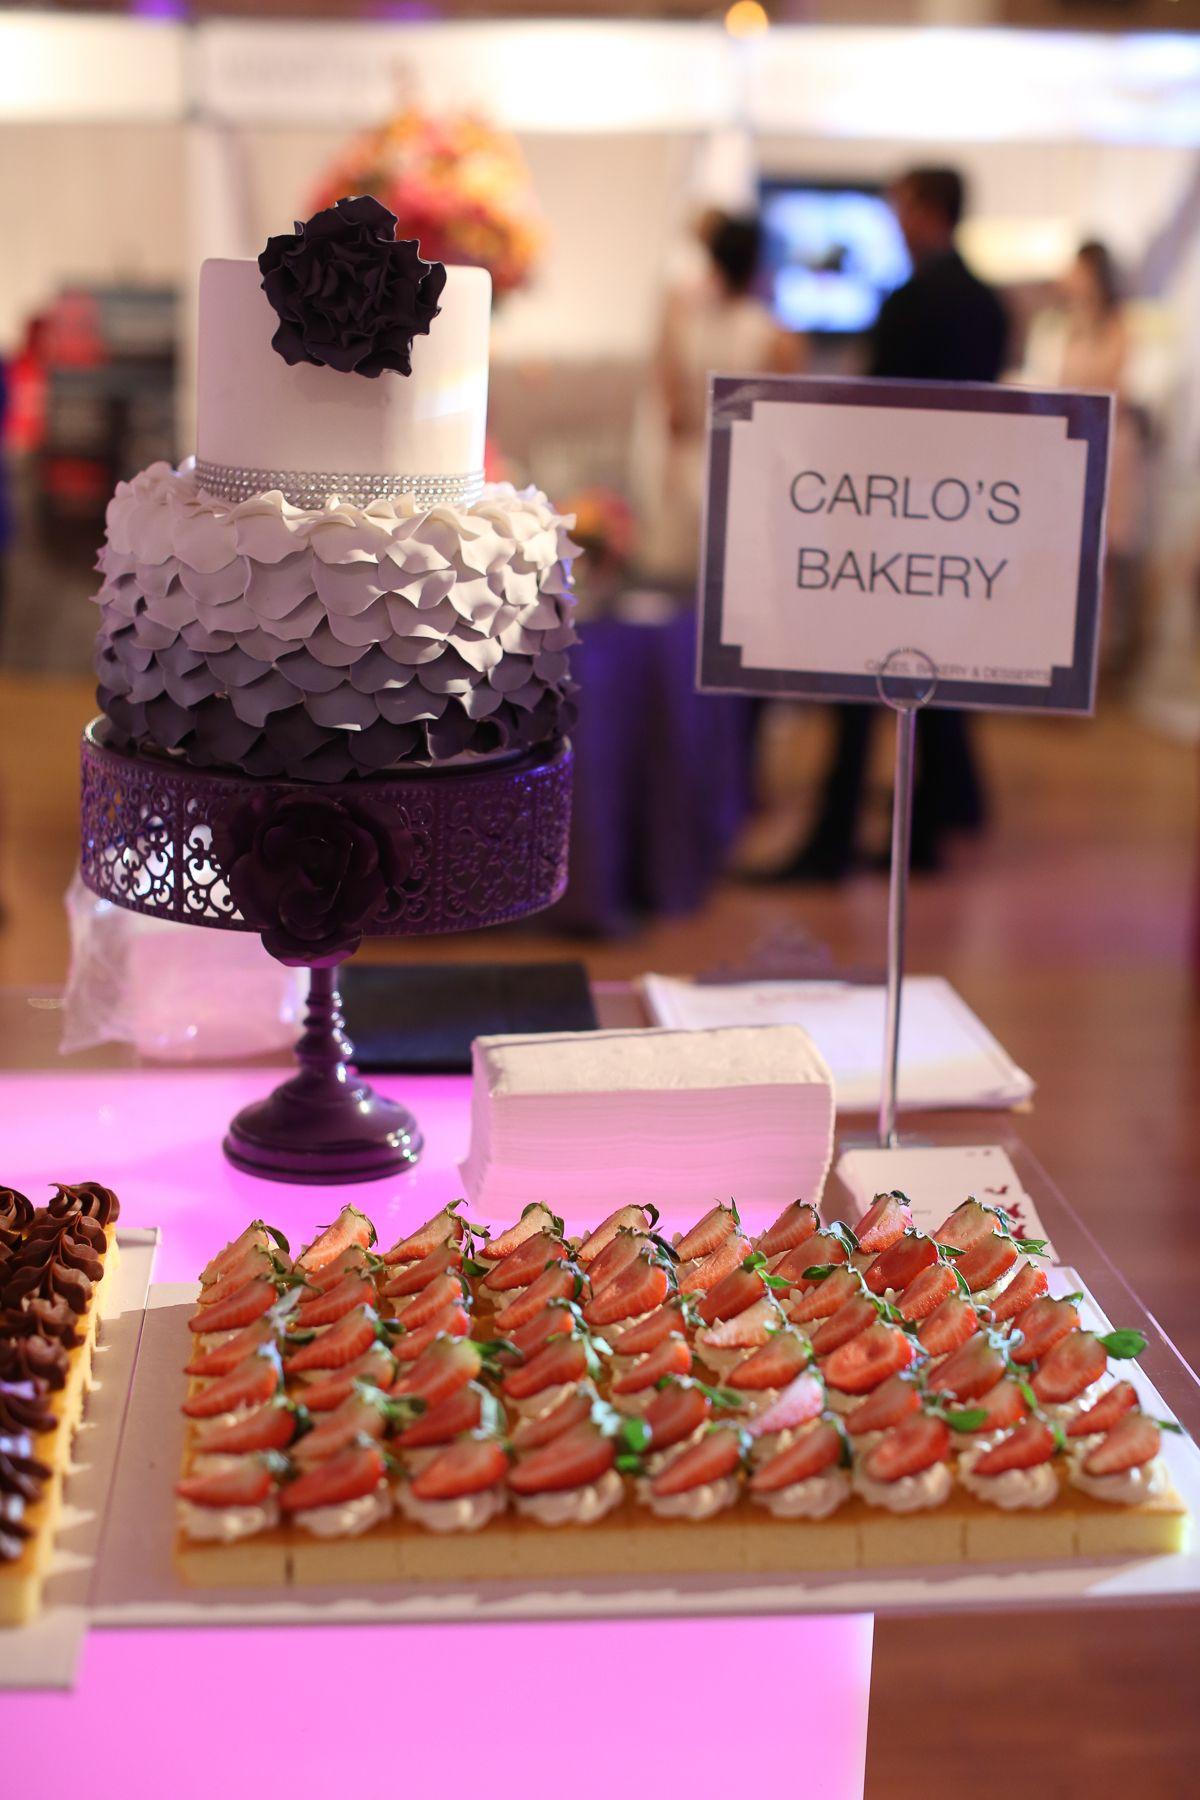 Carlos bakery at weddingsalon carlos bakery bakery